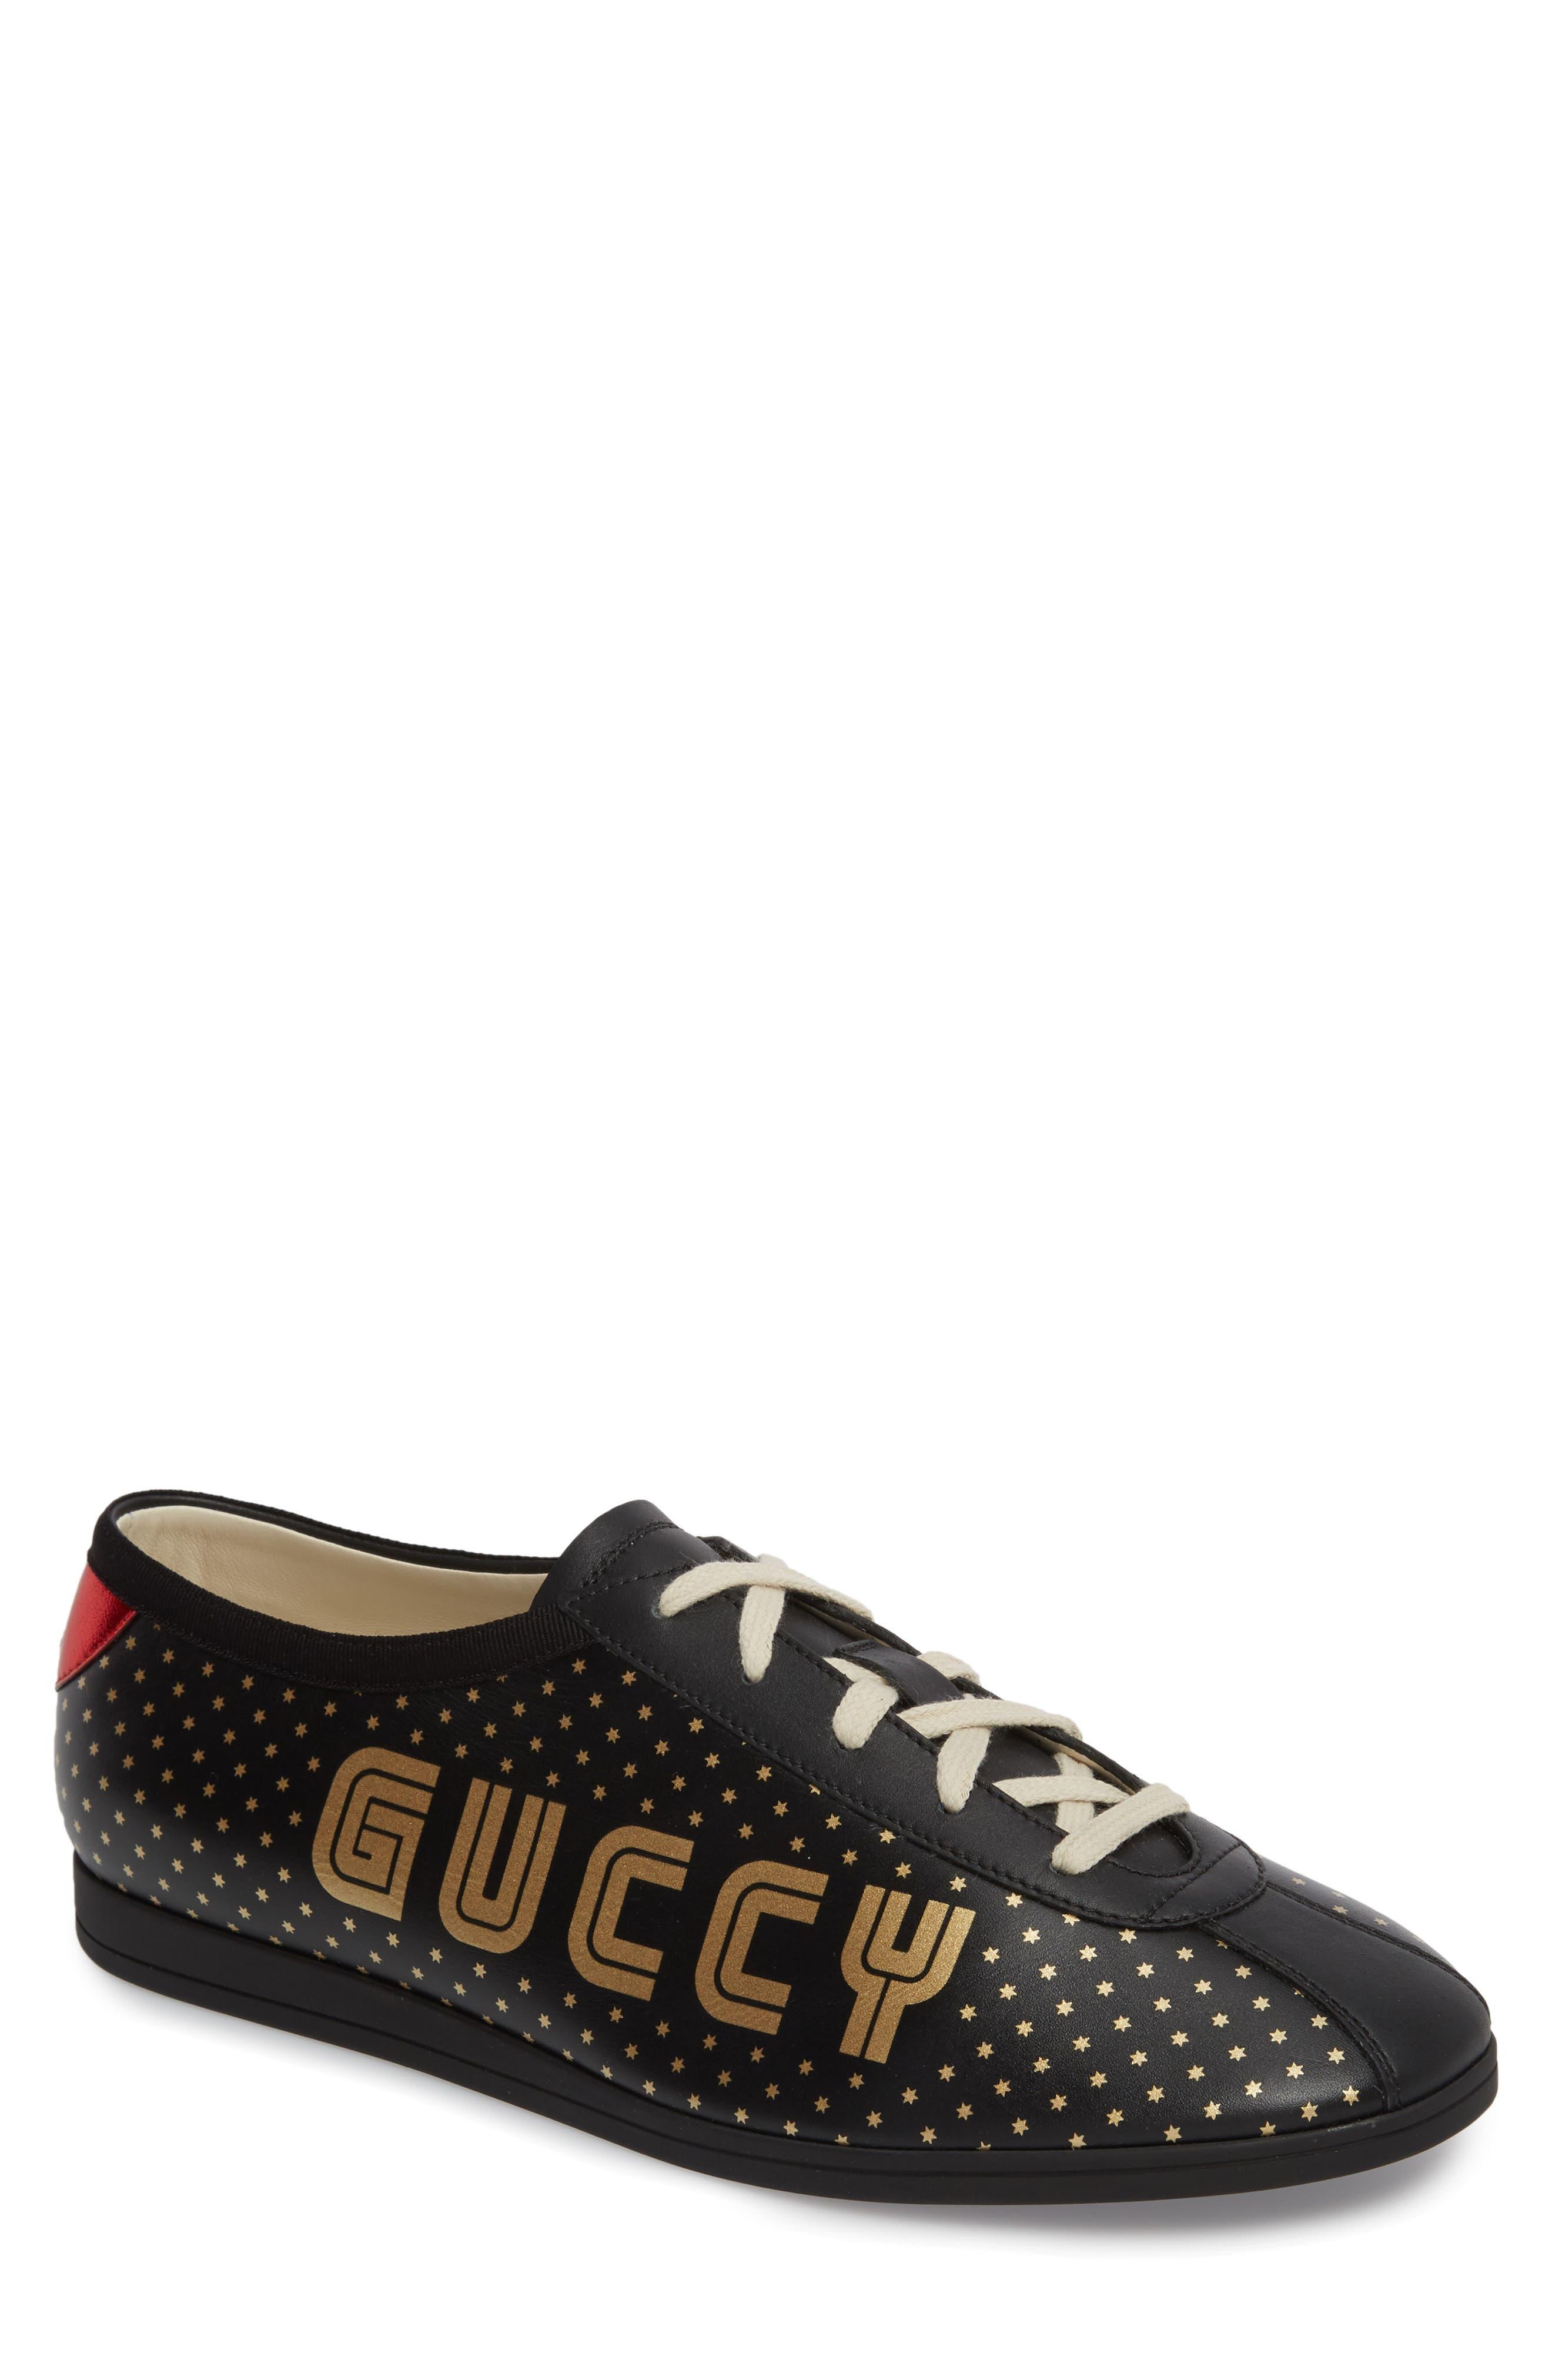 Falacer Guccy Low Top Sneaker,                             Main thumbnail 1, color,                             Black/ Tan